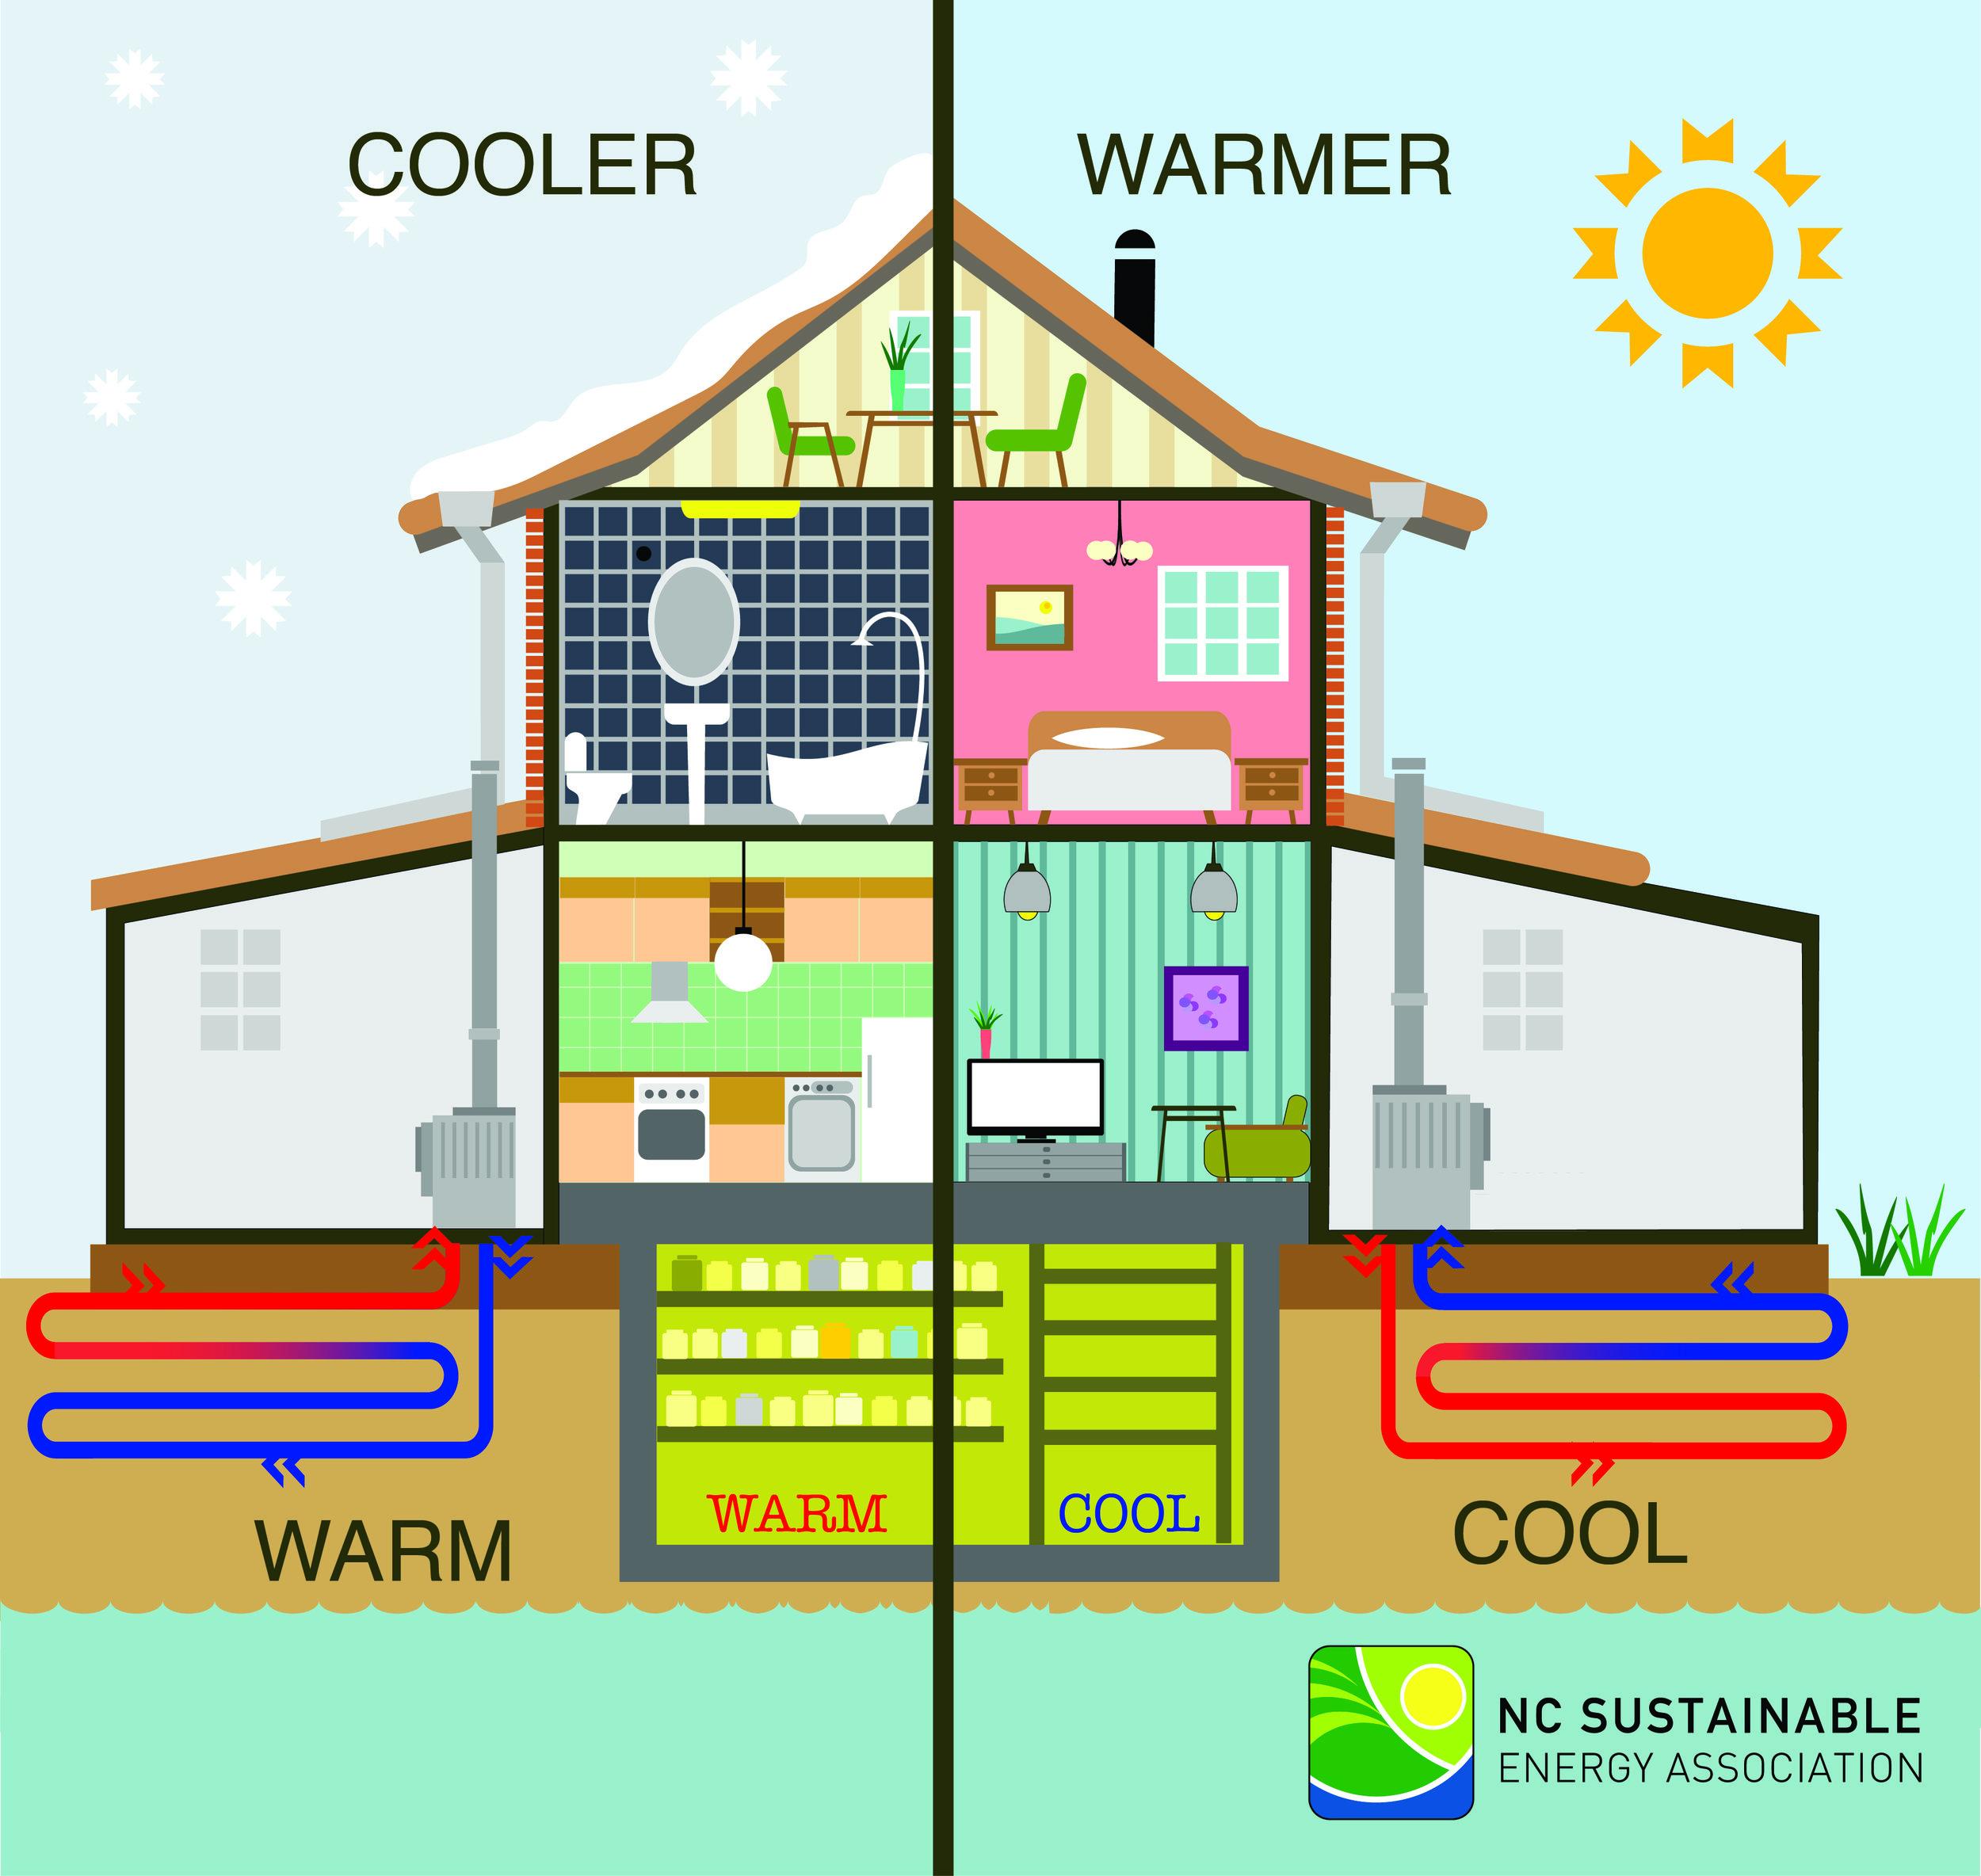 How Geothermal systems work, via www.energync.org